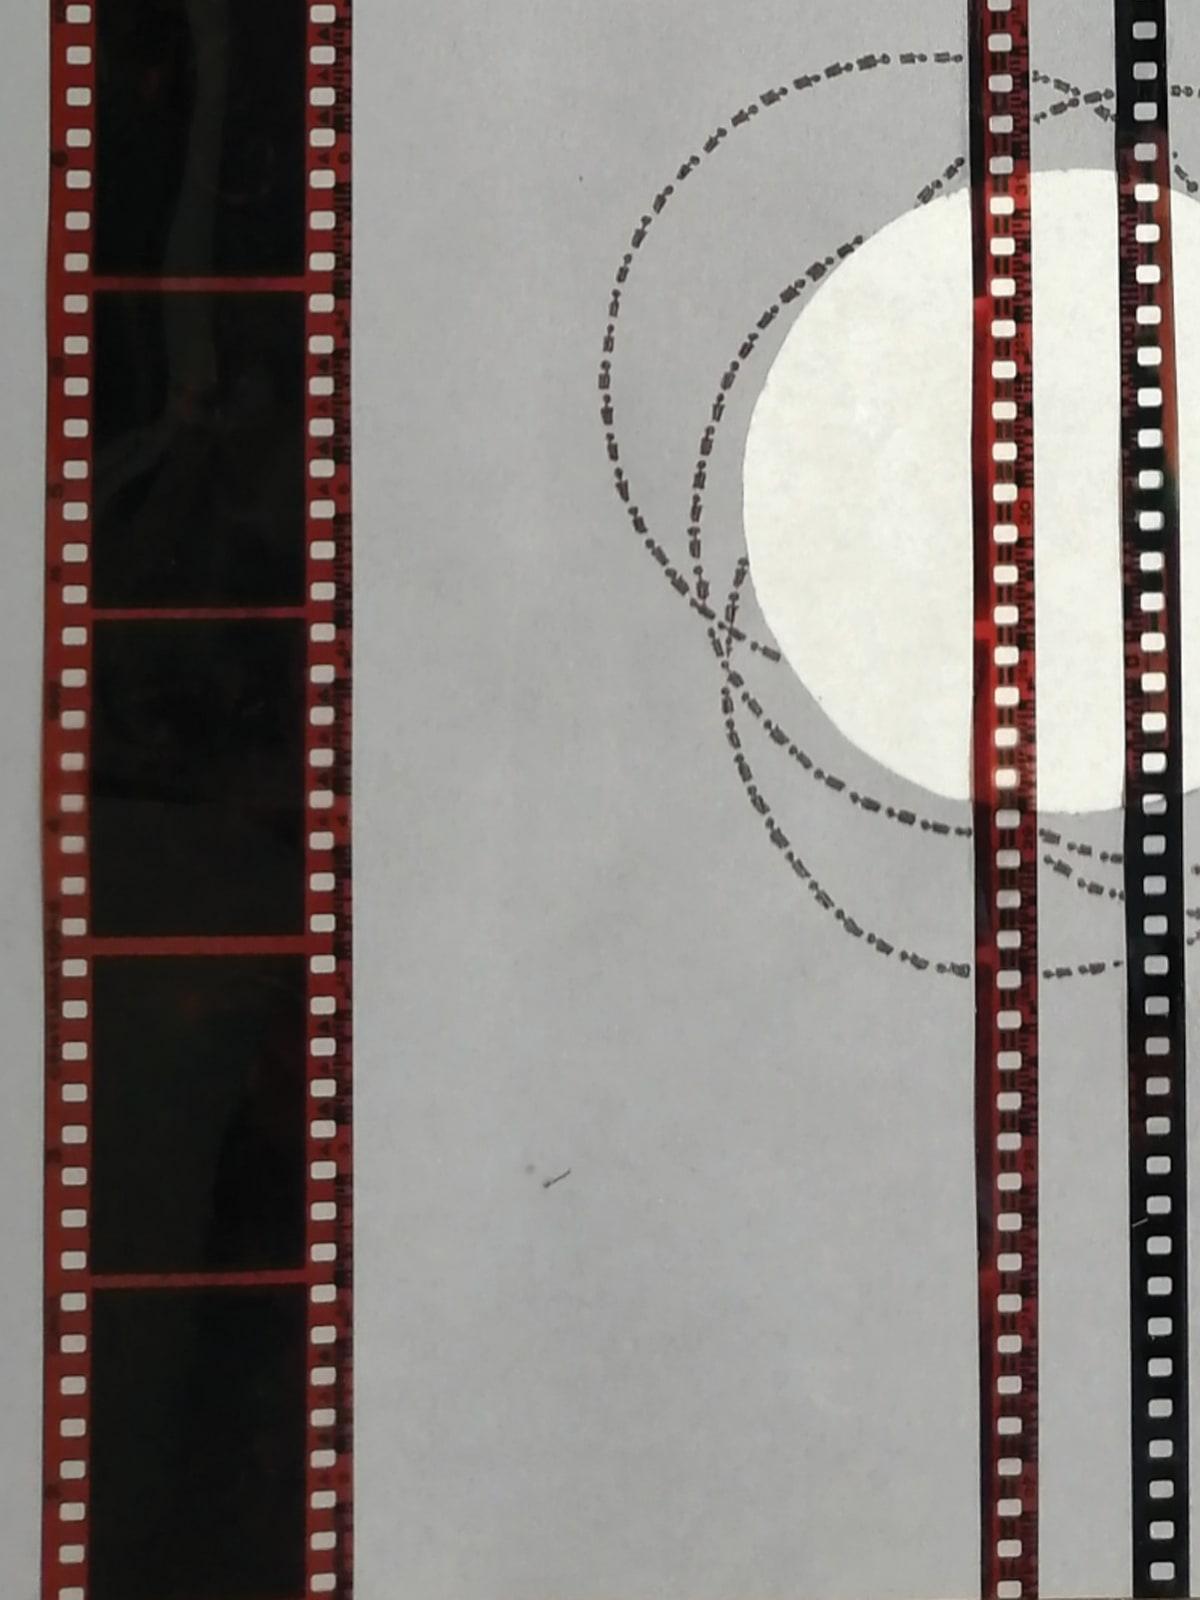 Kanesh Thabendran, Limited Edition Print, 2021, 24